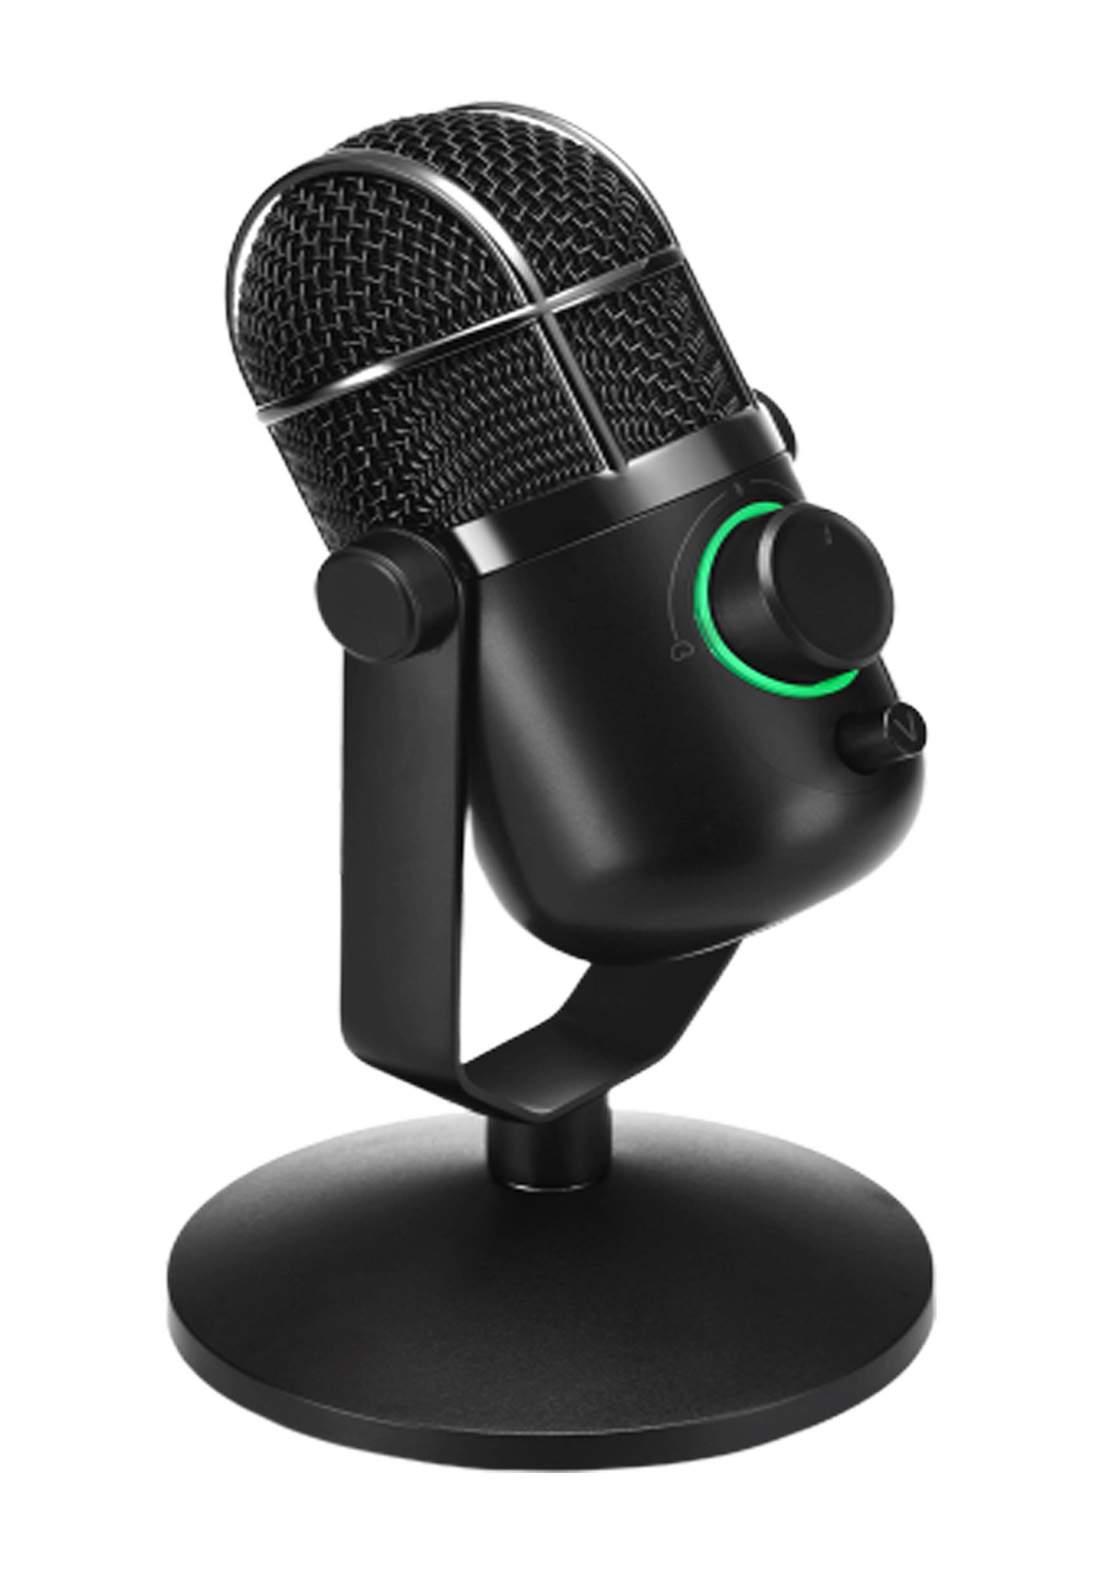 Thronmax MDrill Dome USB Microphone - Black مايكروفون